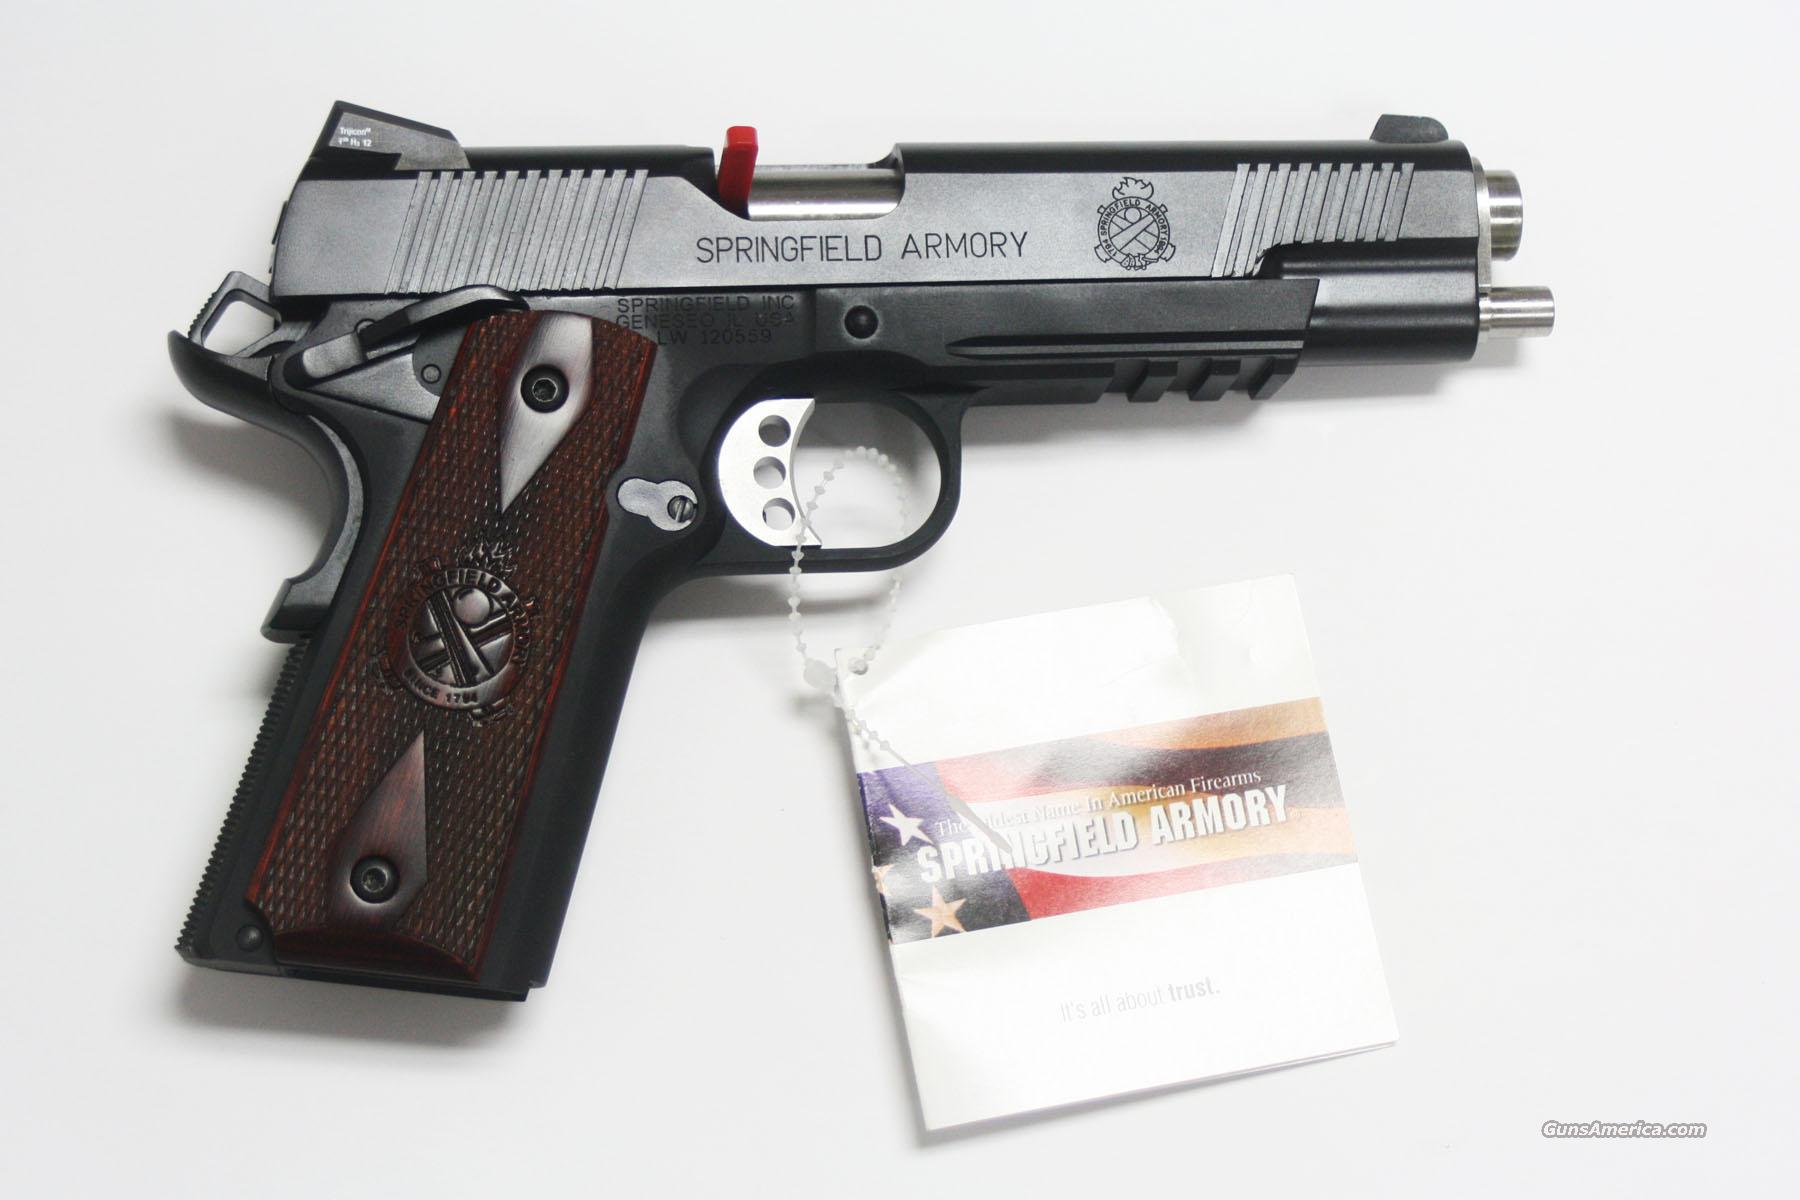 SPRINGFIELD 1911 A1 OPERATOR 45 ACP W/11 GEAR SYSTEM  Guns > Pistols > Springfield Armory Pistols > 1911 Type